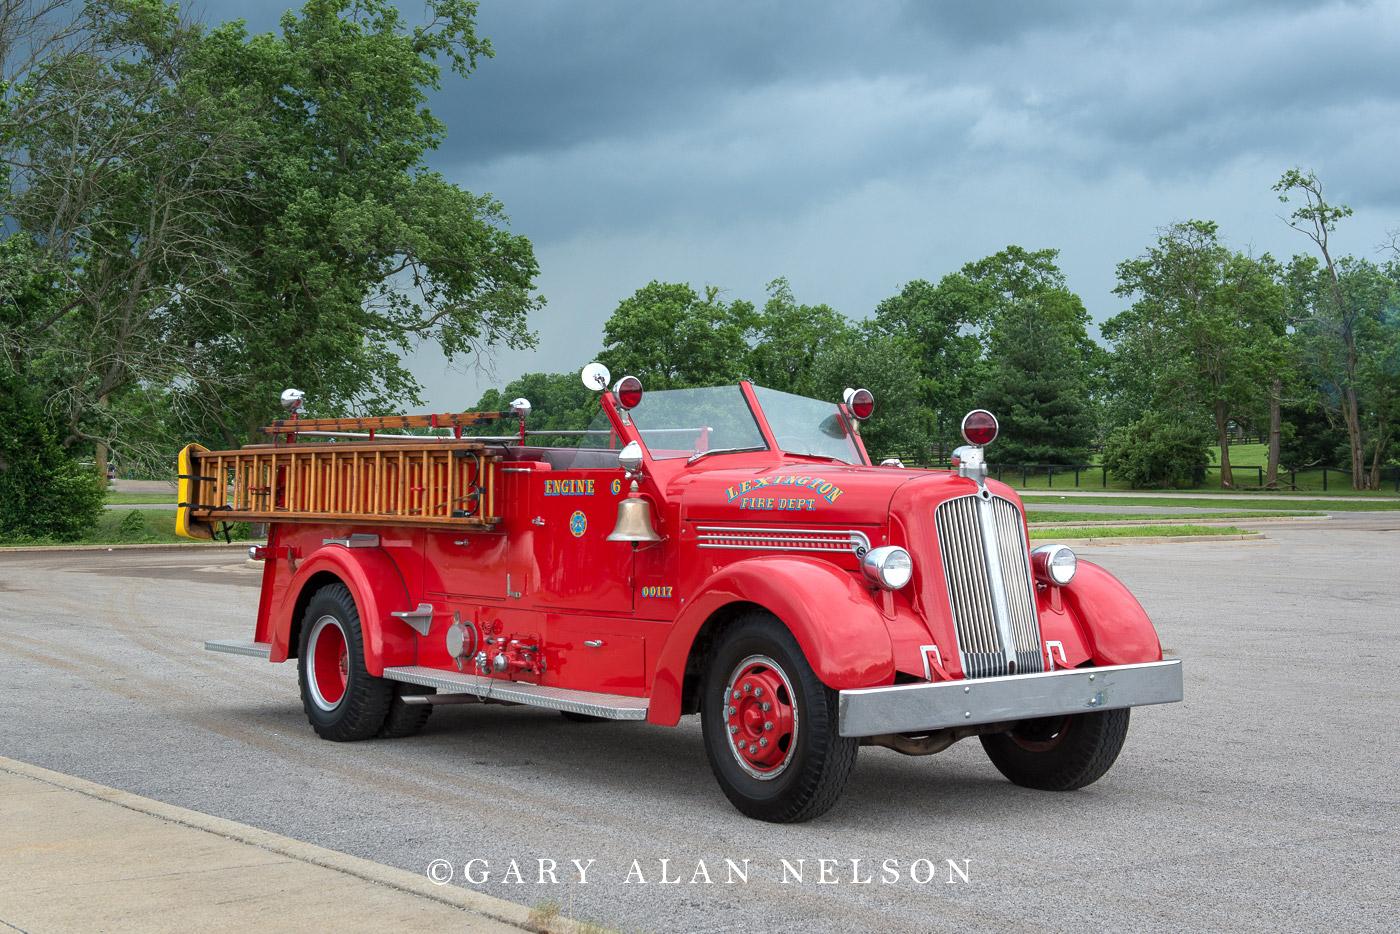 1949 Seagraves Model 66EB ladder truck